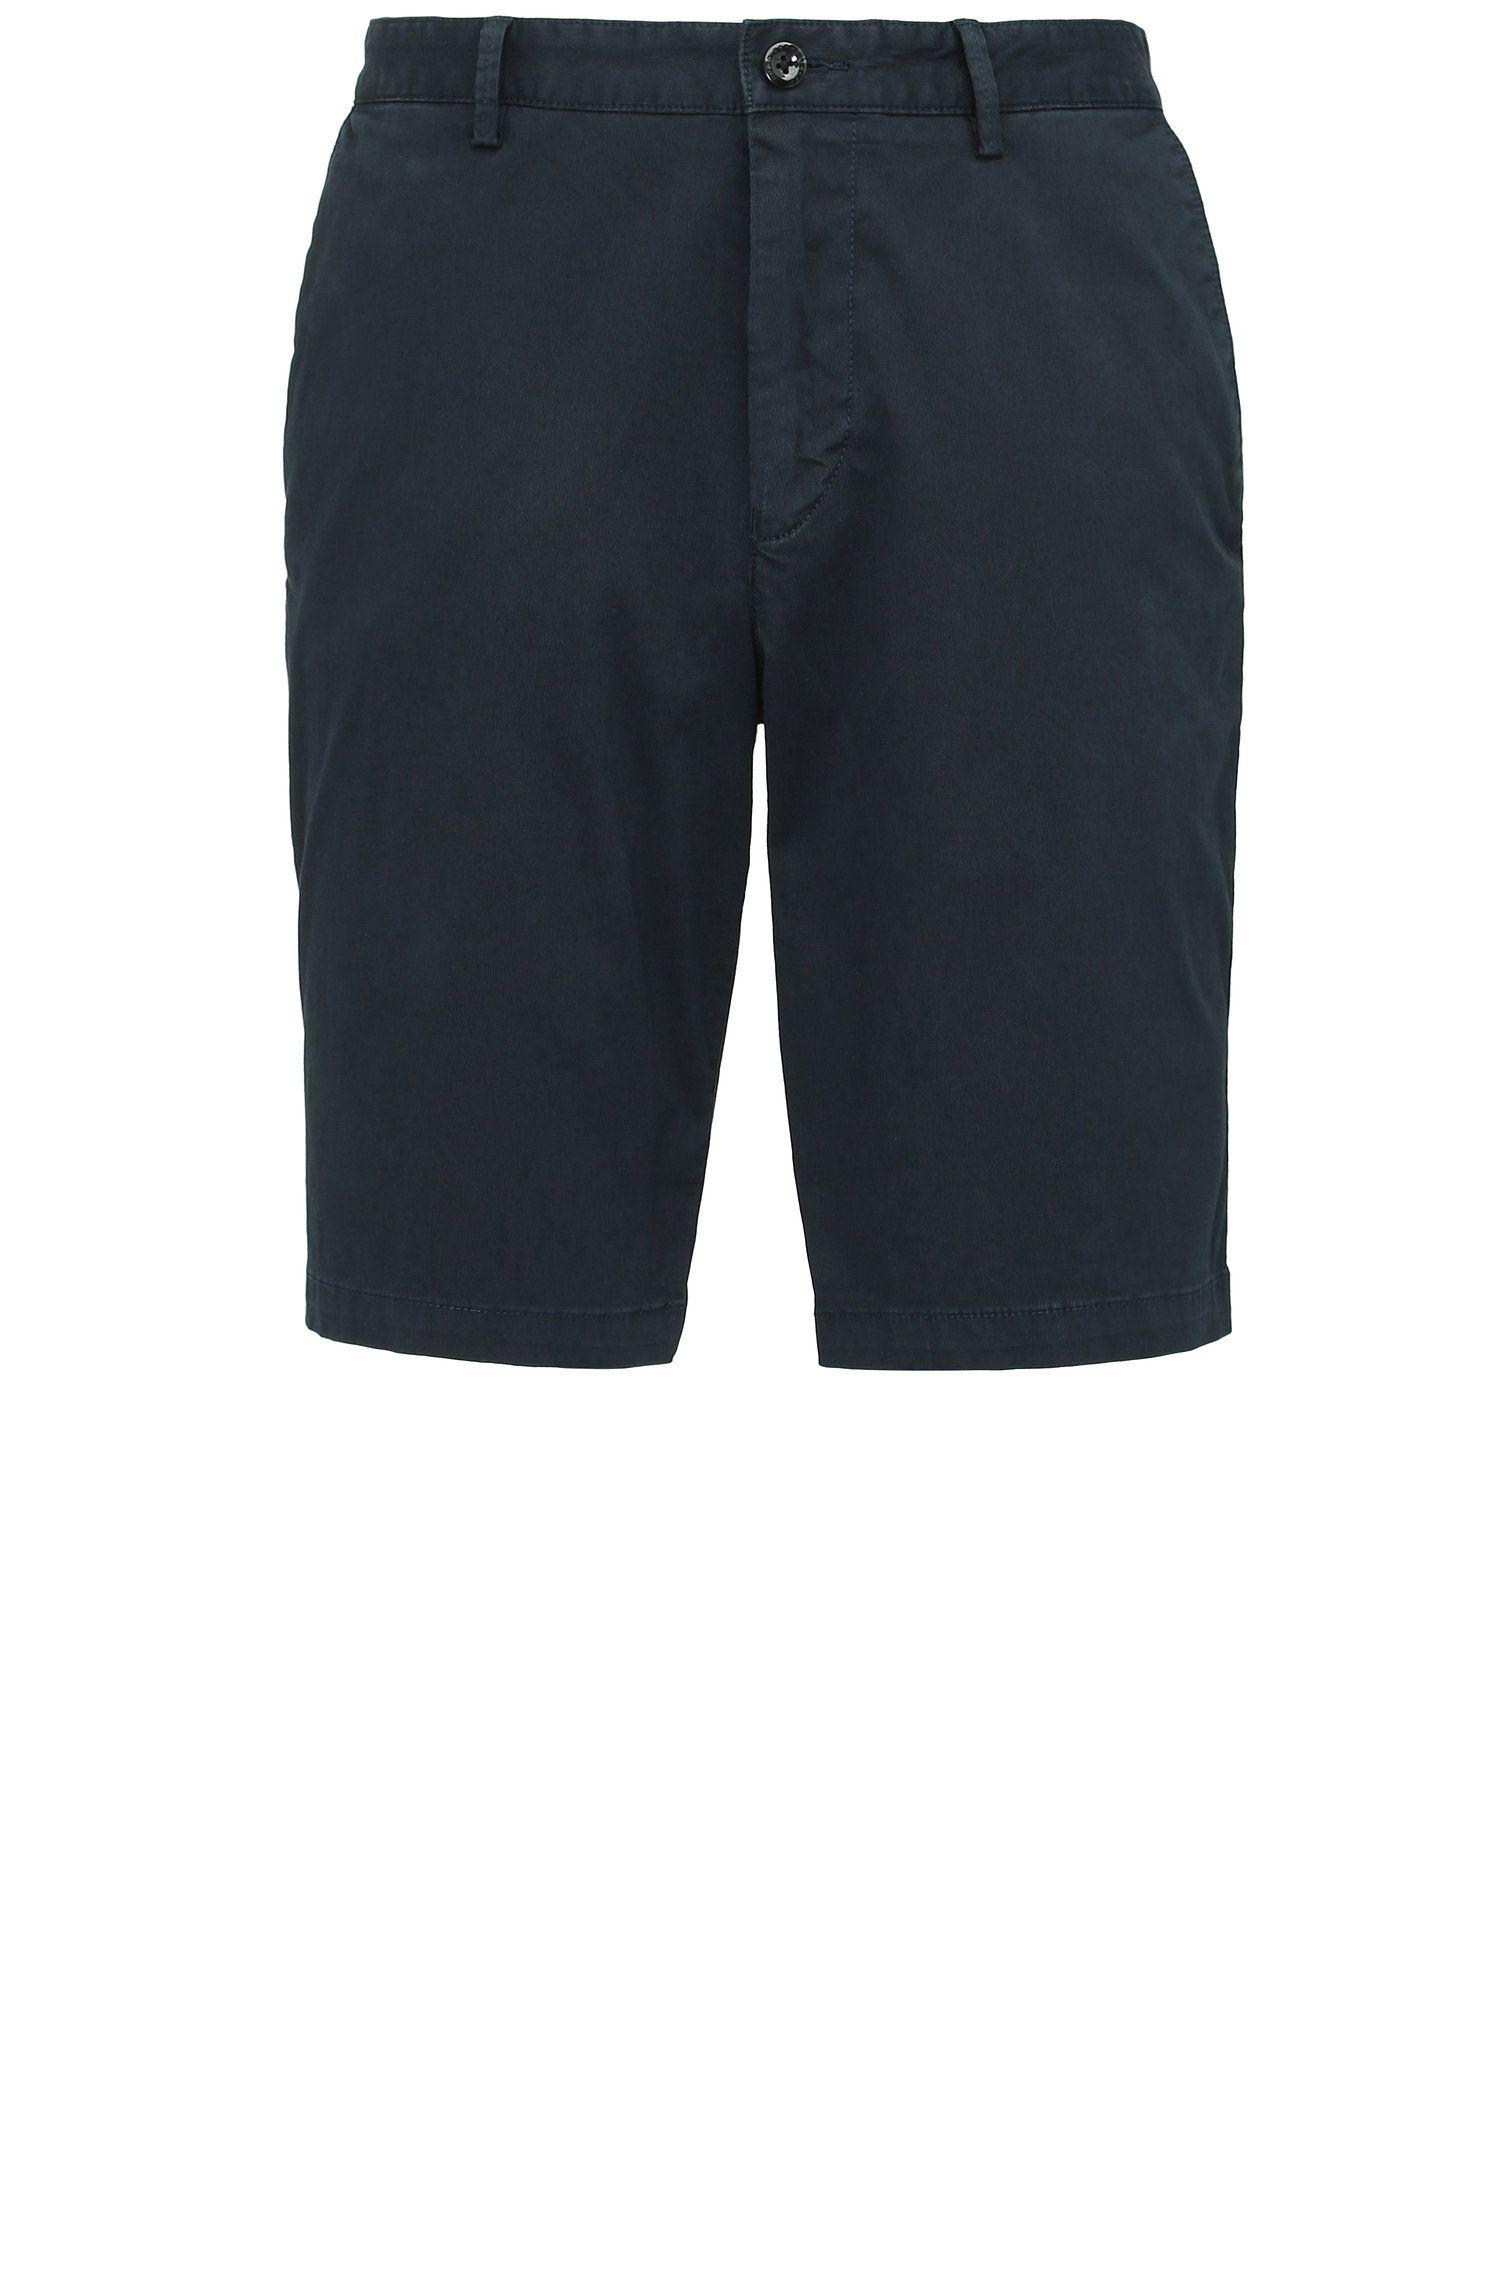 Shorts regular fit en algodón elástico: 'C-Clyde2-1-D'